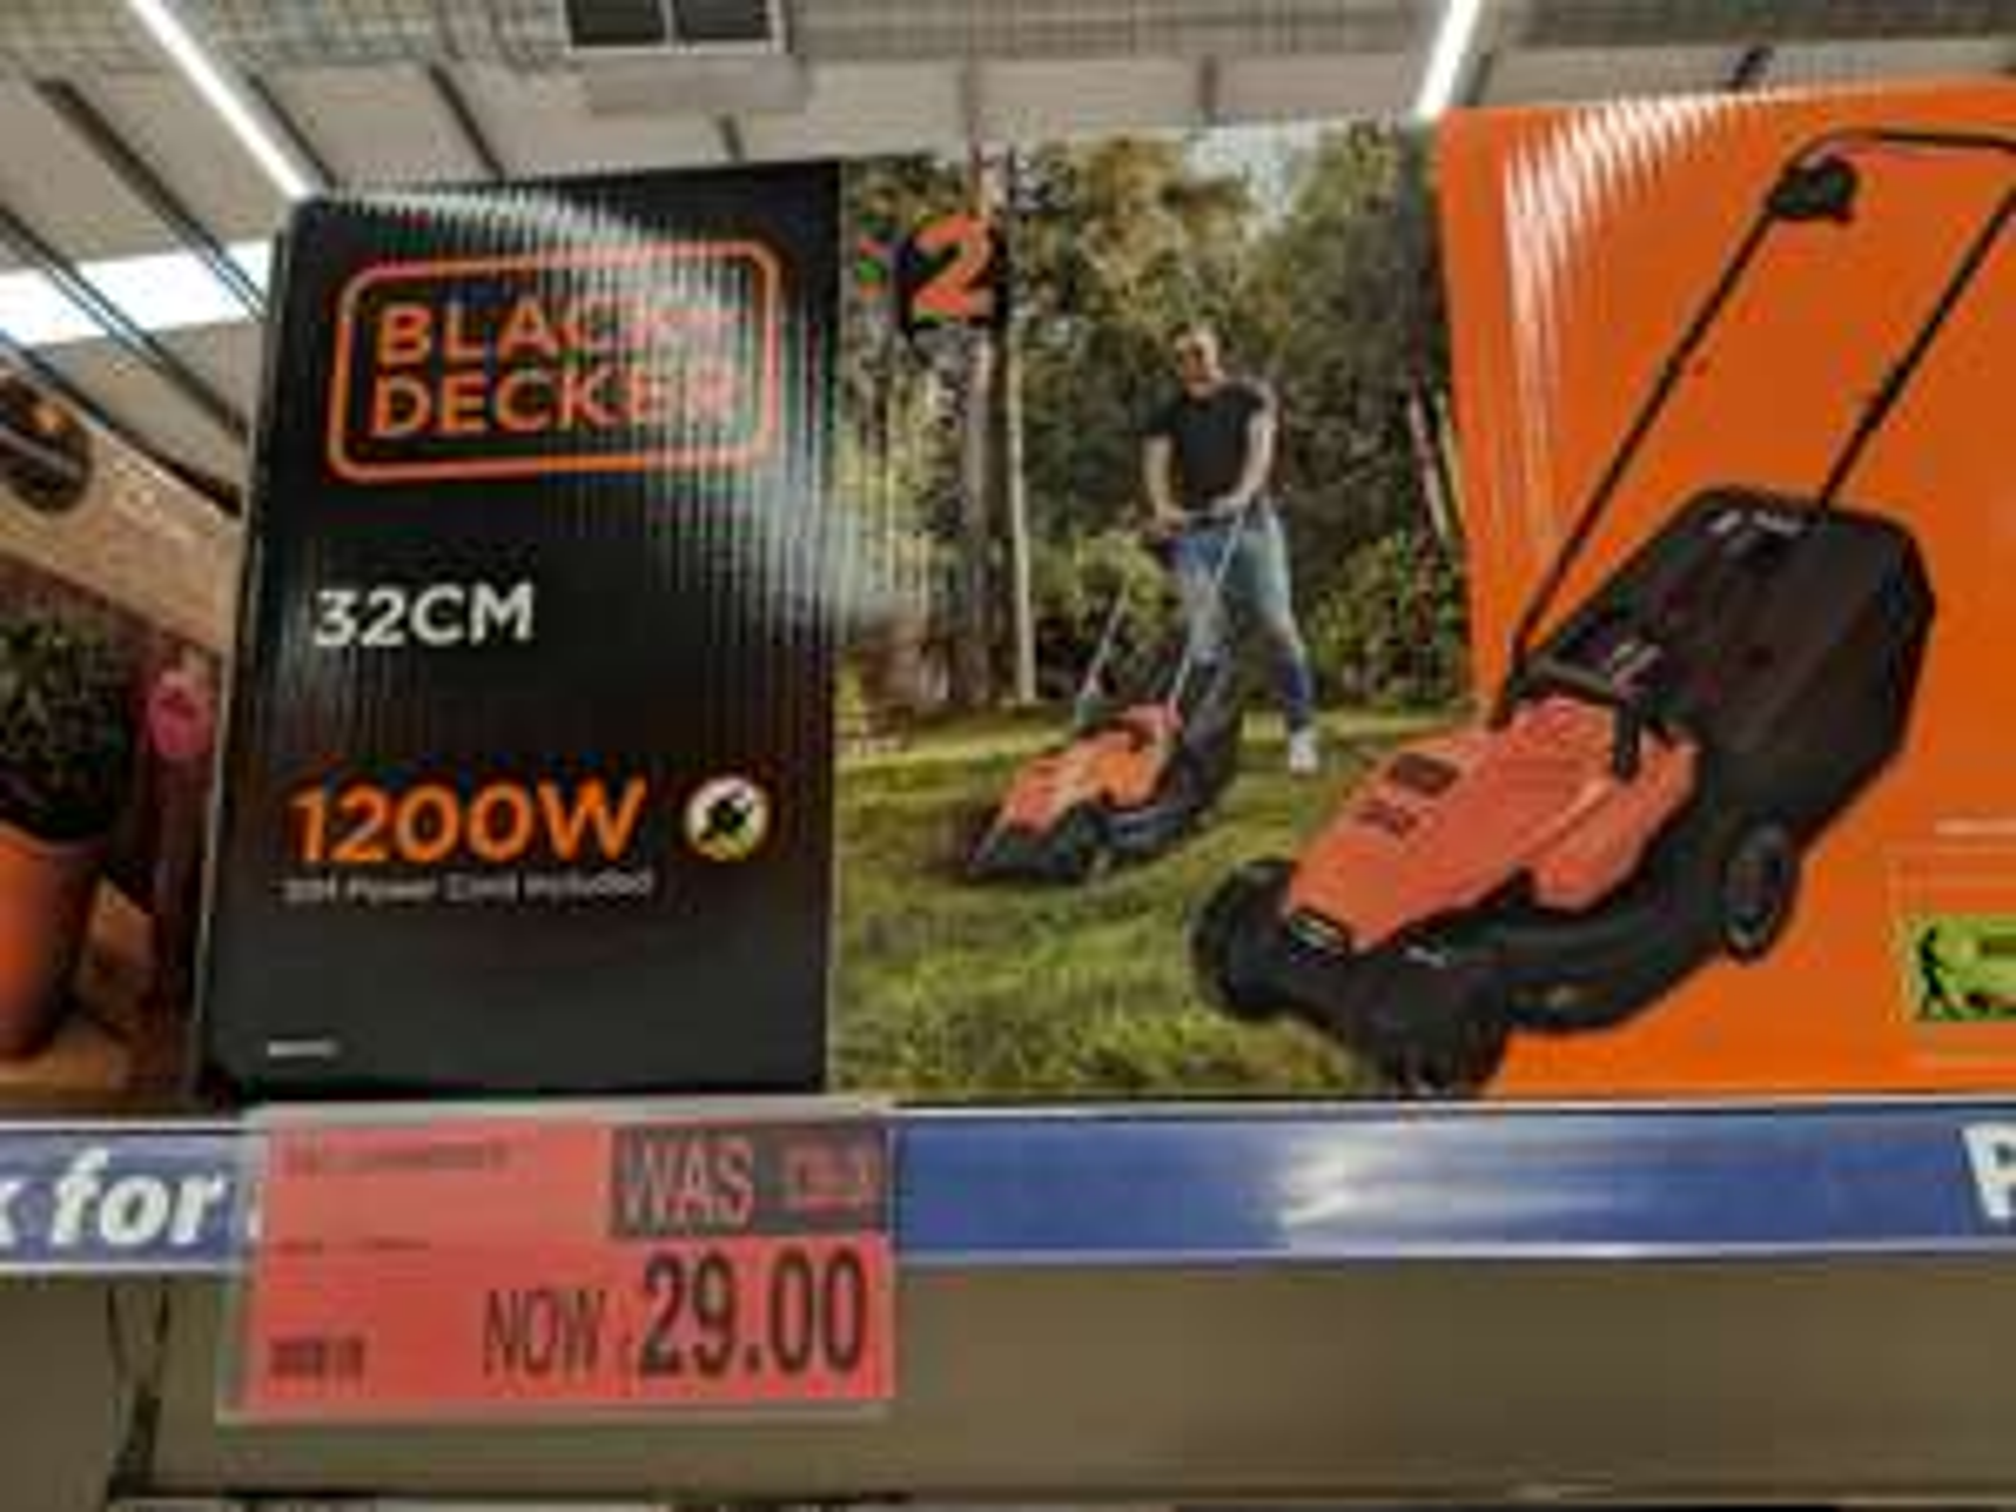 Black & Decker BEMW451 Rotary Lawnmower 320mm 240v at B&M for £29